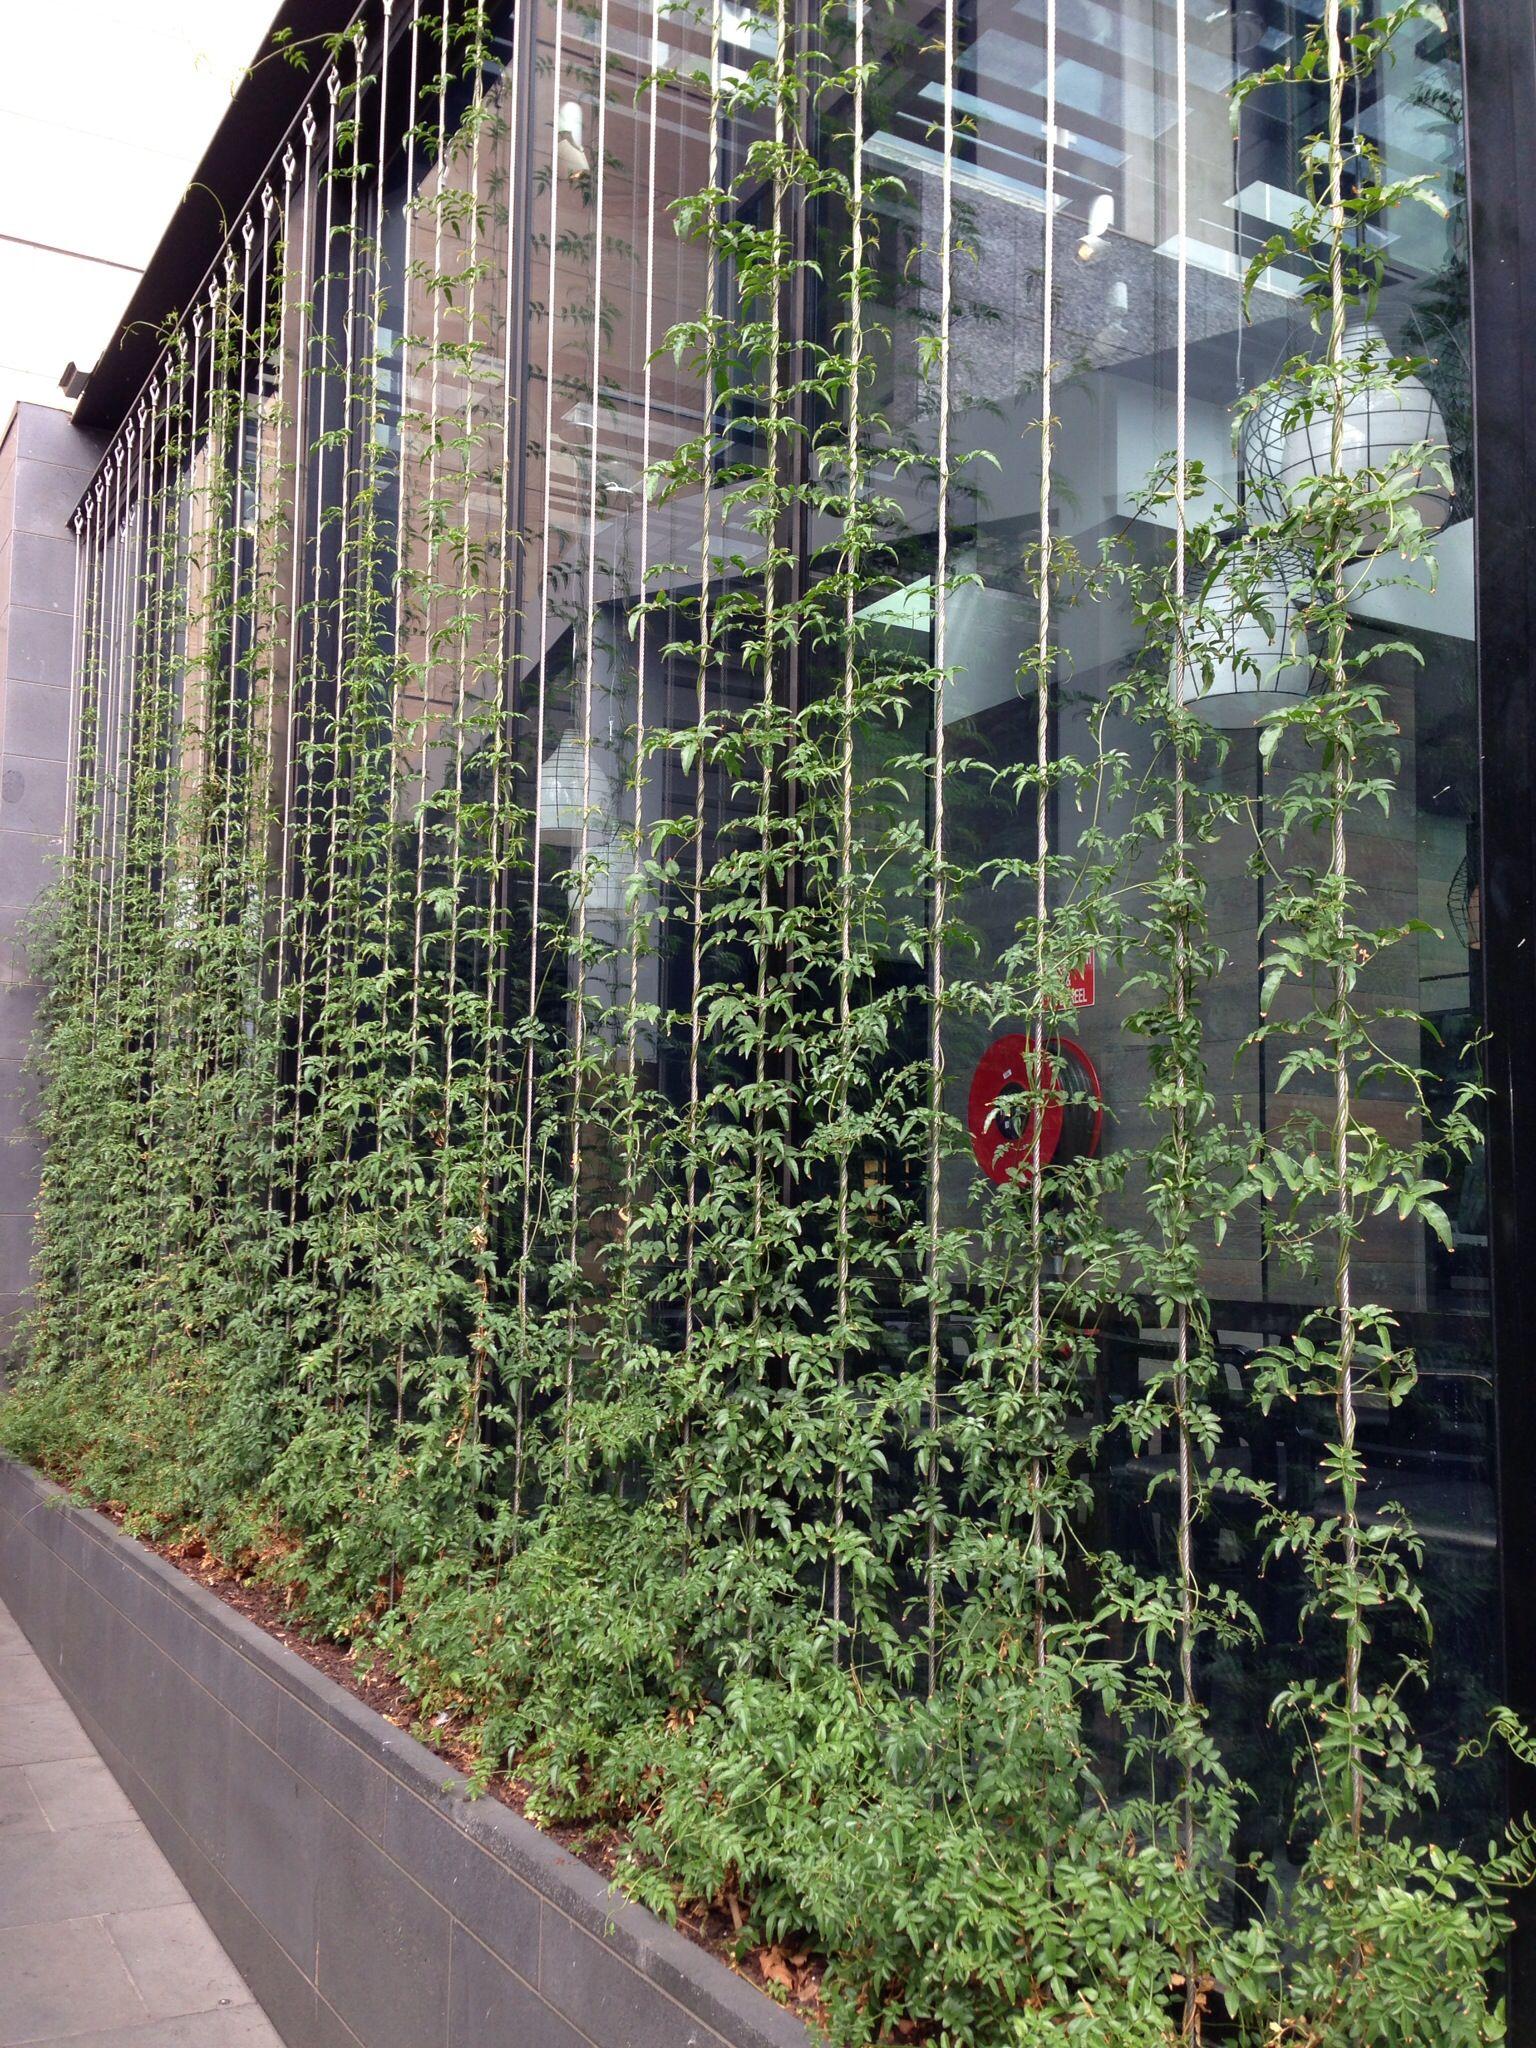 Grimpante jasmin d co balcon pinterest jasmin for Plante exterieur pour balcon